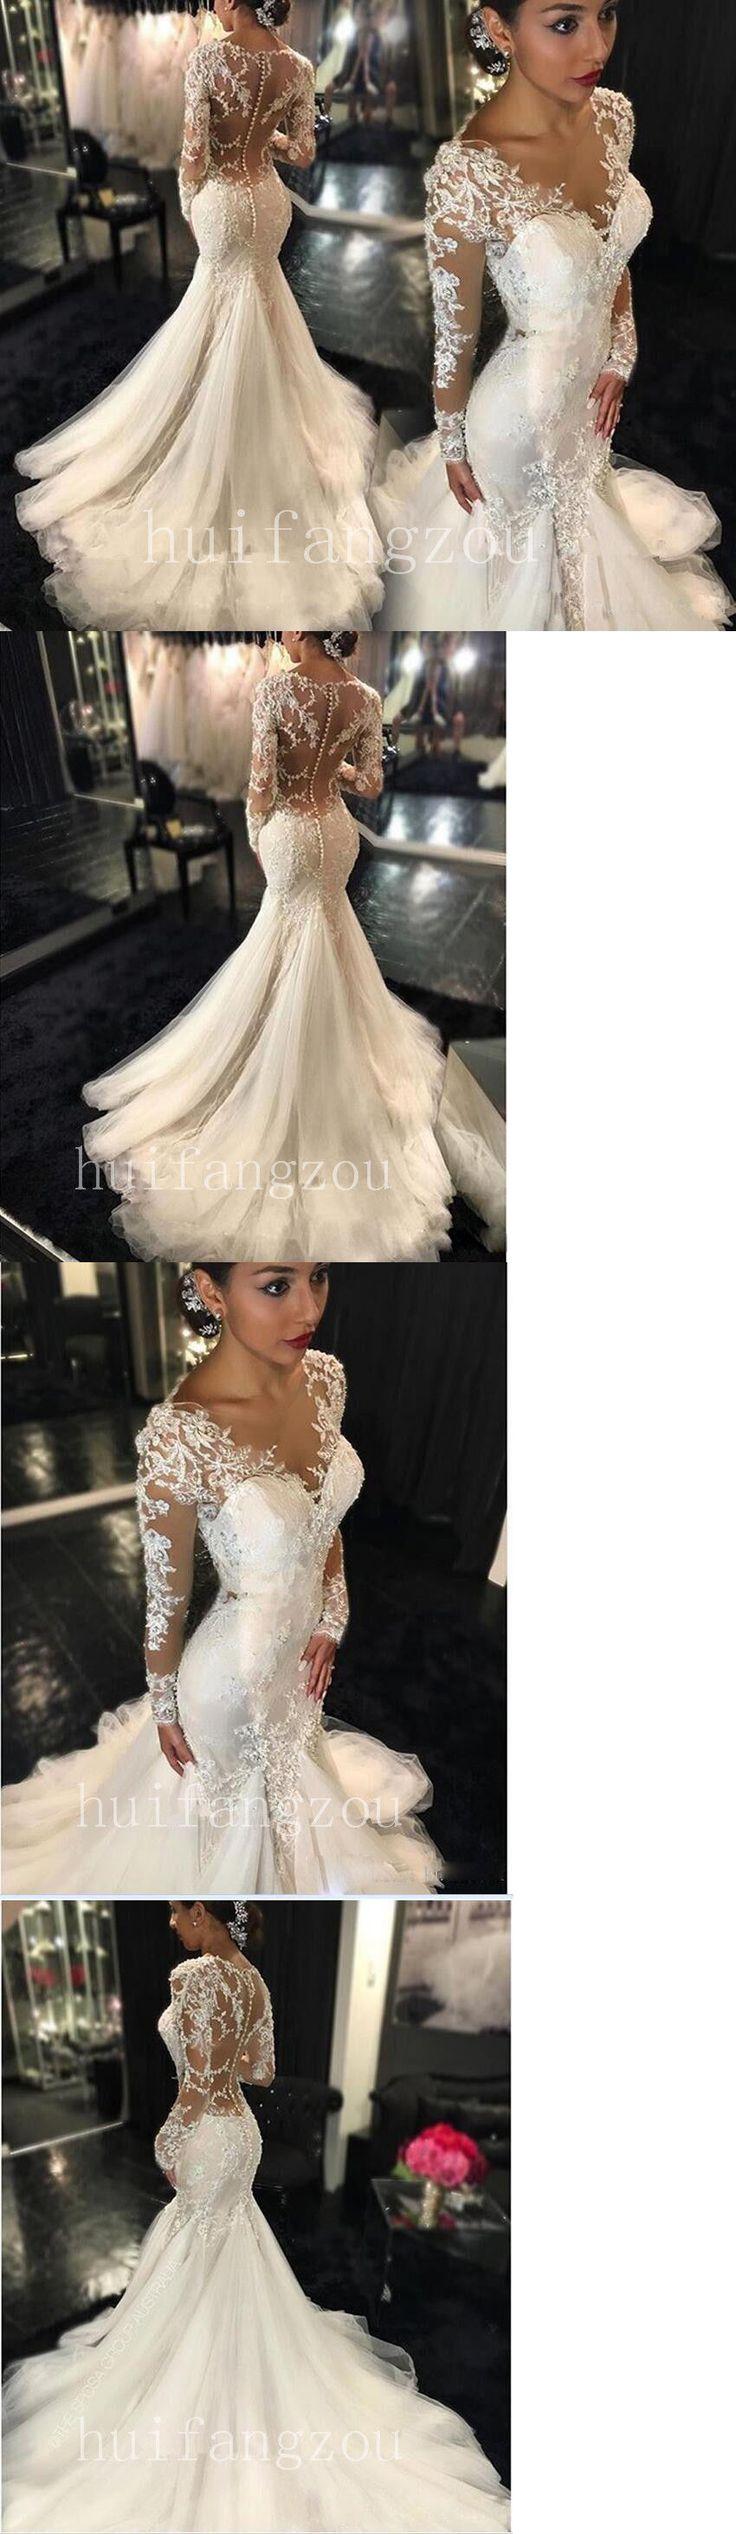 Wedding Dresses: White Ivory Mermaid Wedding Dress Bridal Gown Size 4 6 8 10 12 14 16 18 20 Plus -> BUY IT NOW ONLY: $173.99 on eBay!